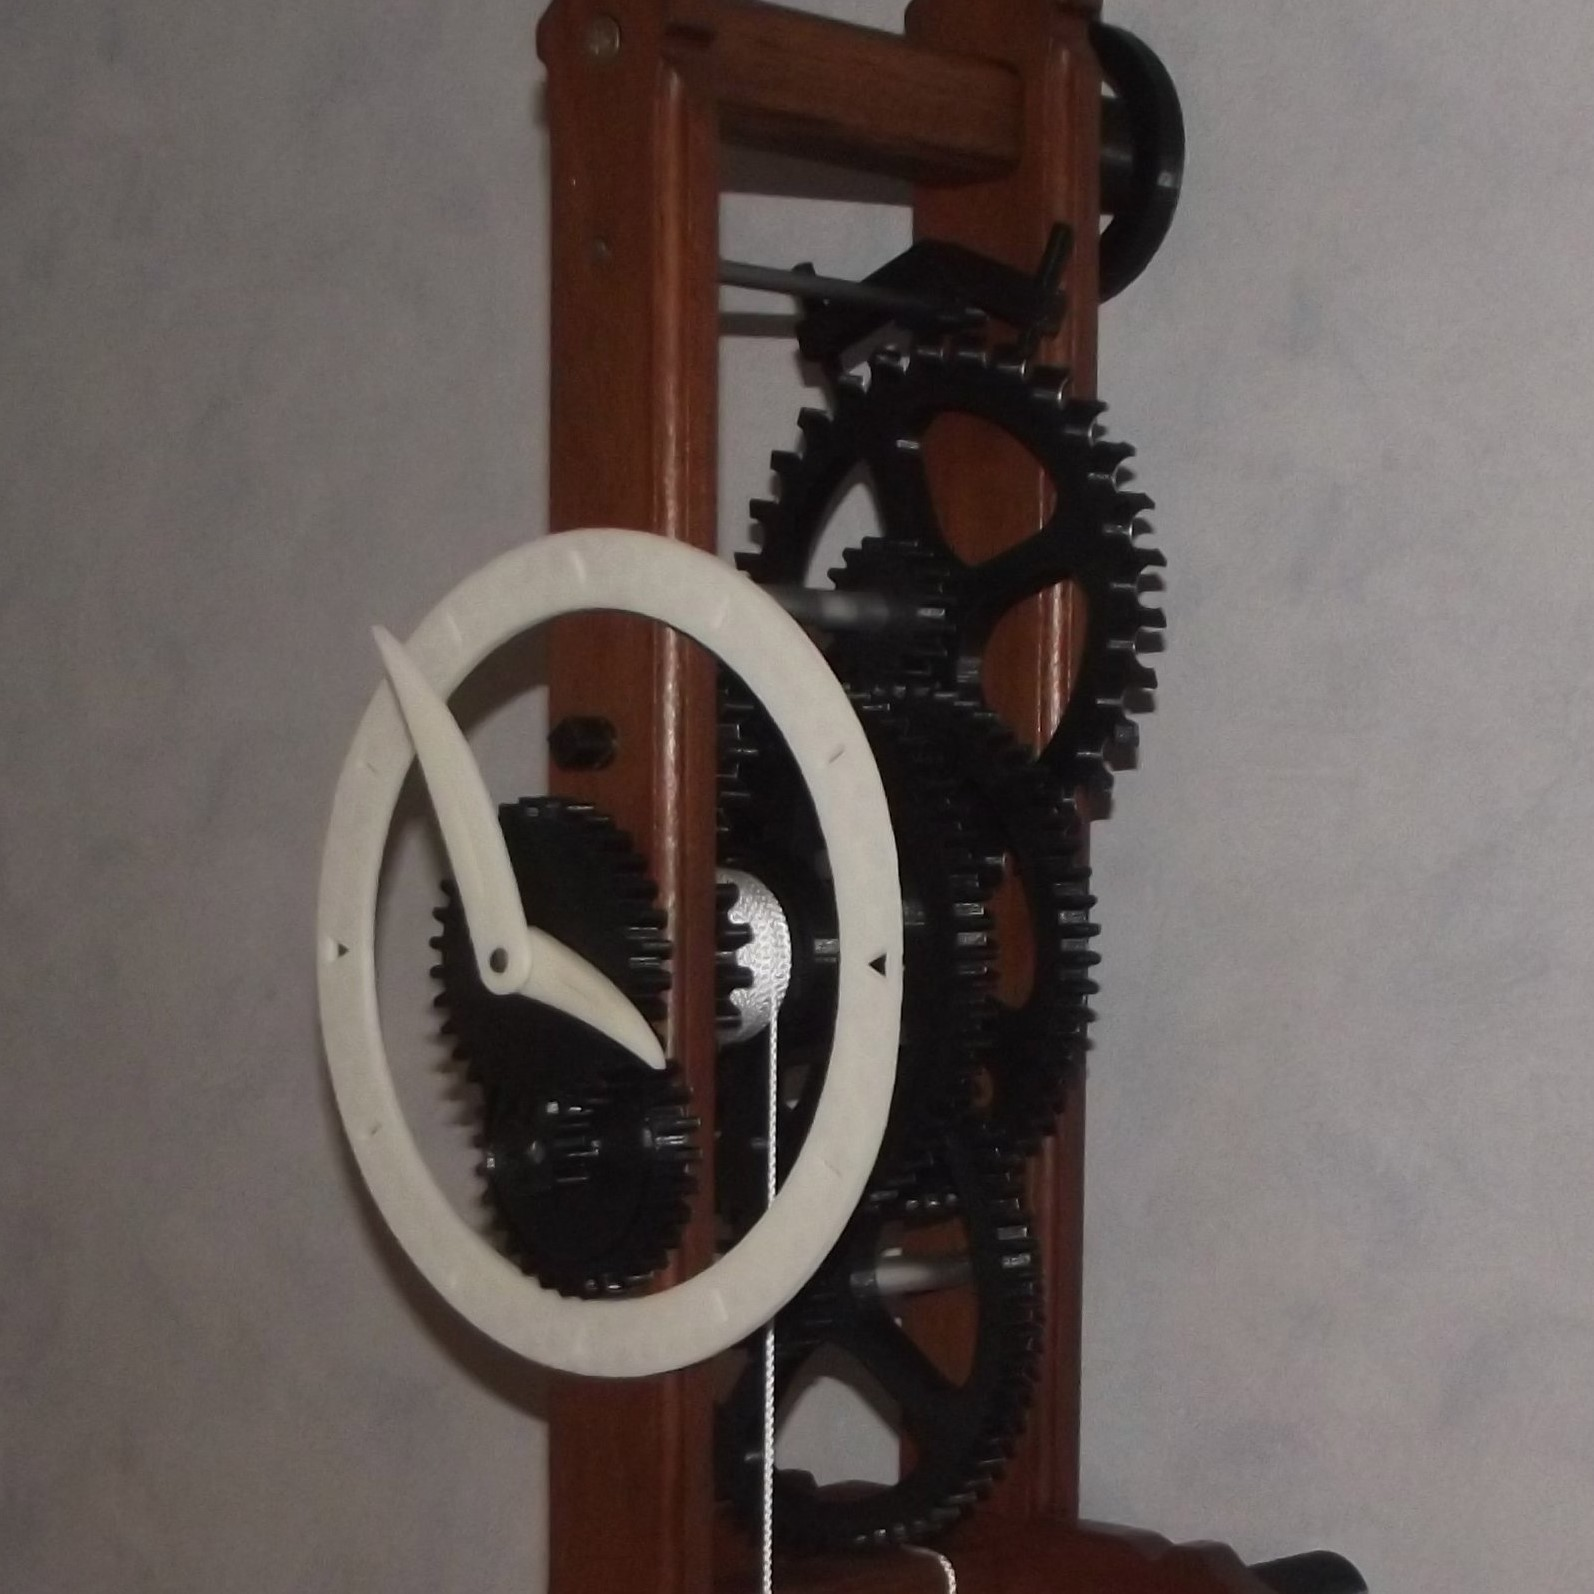 Horloge - Copie.JPG Download free STL file Mechanical clock to go up • Object to 3D print, CedricRoy